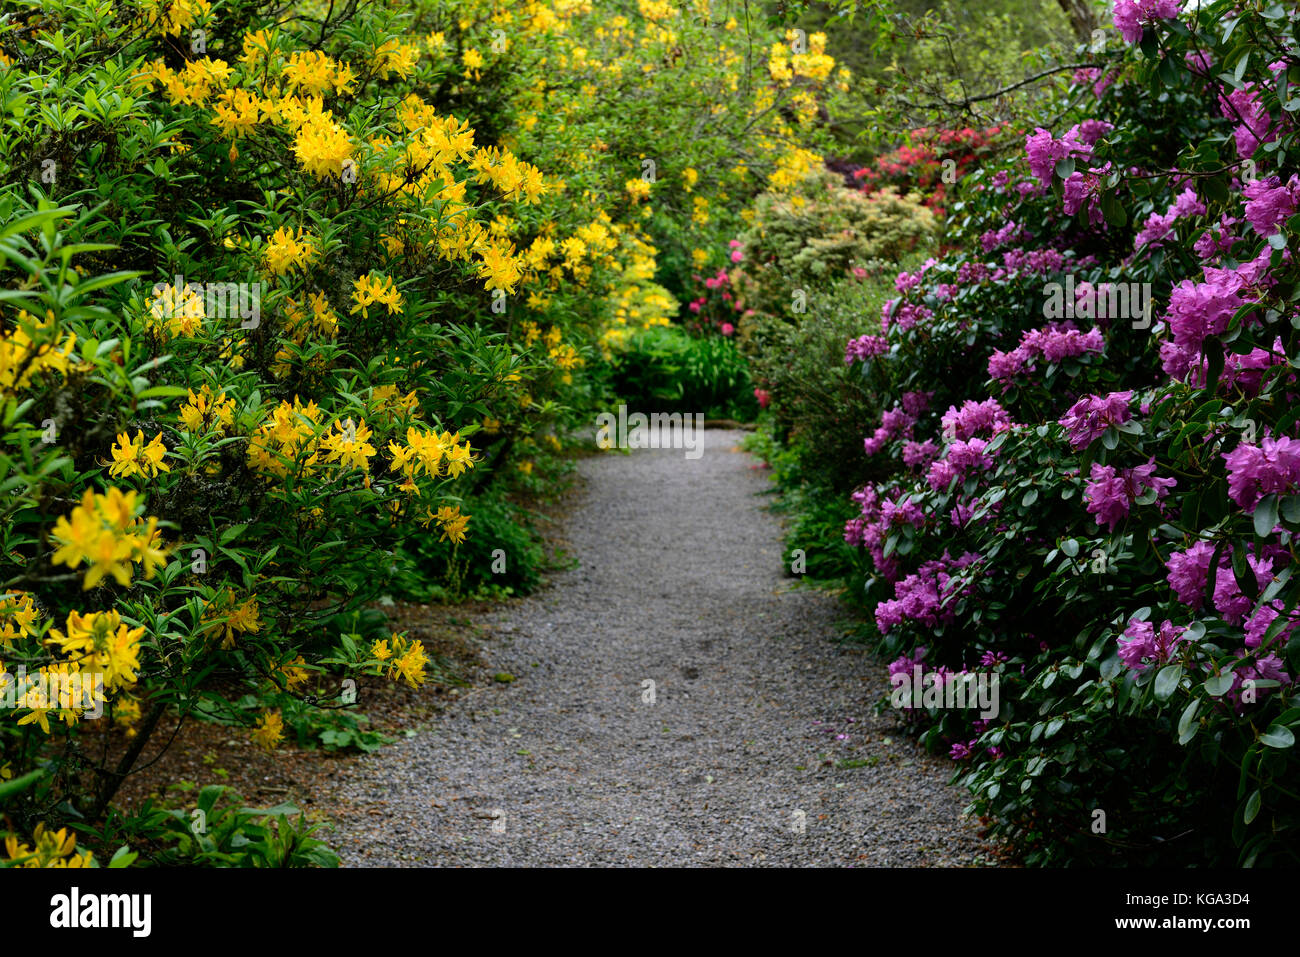 rhododendron jaune jaune azalea pontica rhododendrons arbustes fleurs jaunes la floraison. Black Bedroom Furniture Sets. Home Design Ideas